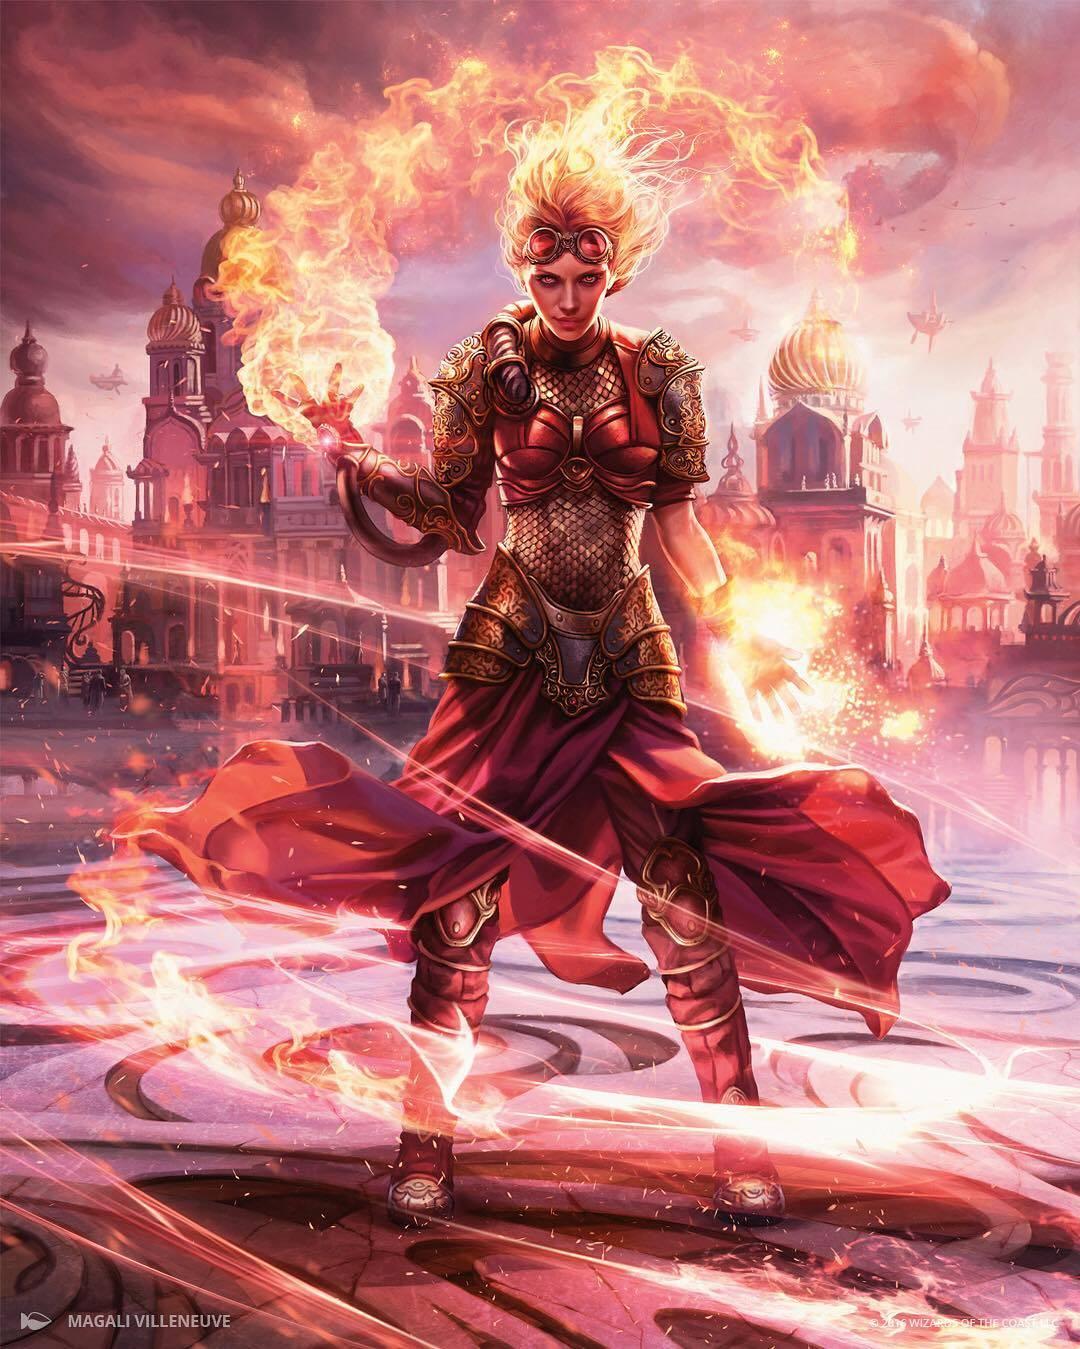 Chandra Torch of Defiance by Magali Villeneuve 1080 x 1349